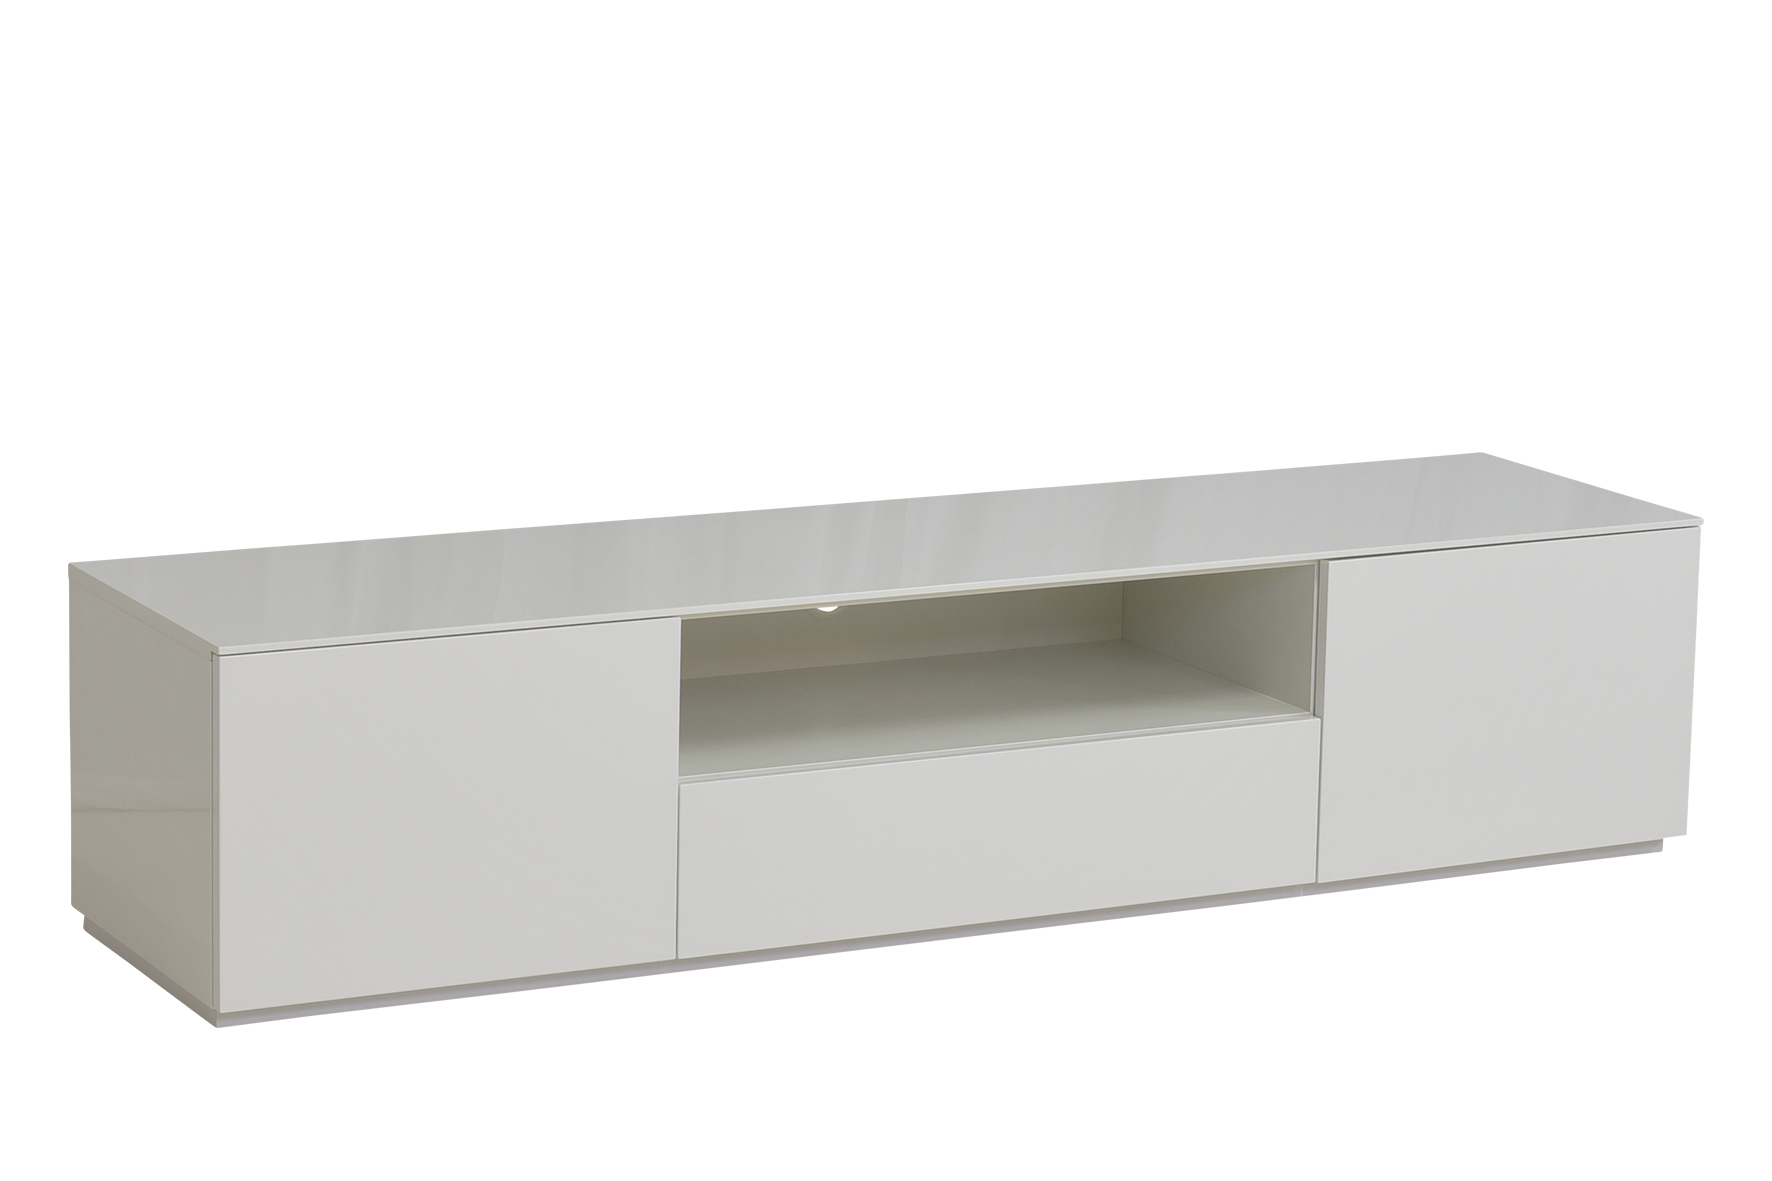 lowboard monaco 180 cm weiss hochglanz lackiert tv m bel mdv h. Black Bedroom Furniture Sets. Home Design Ideas